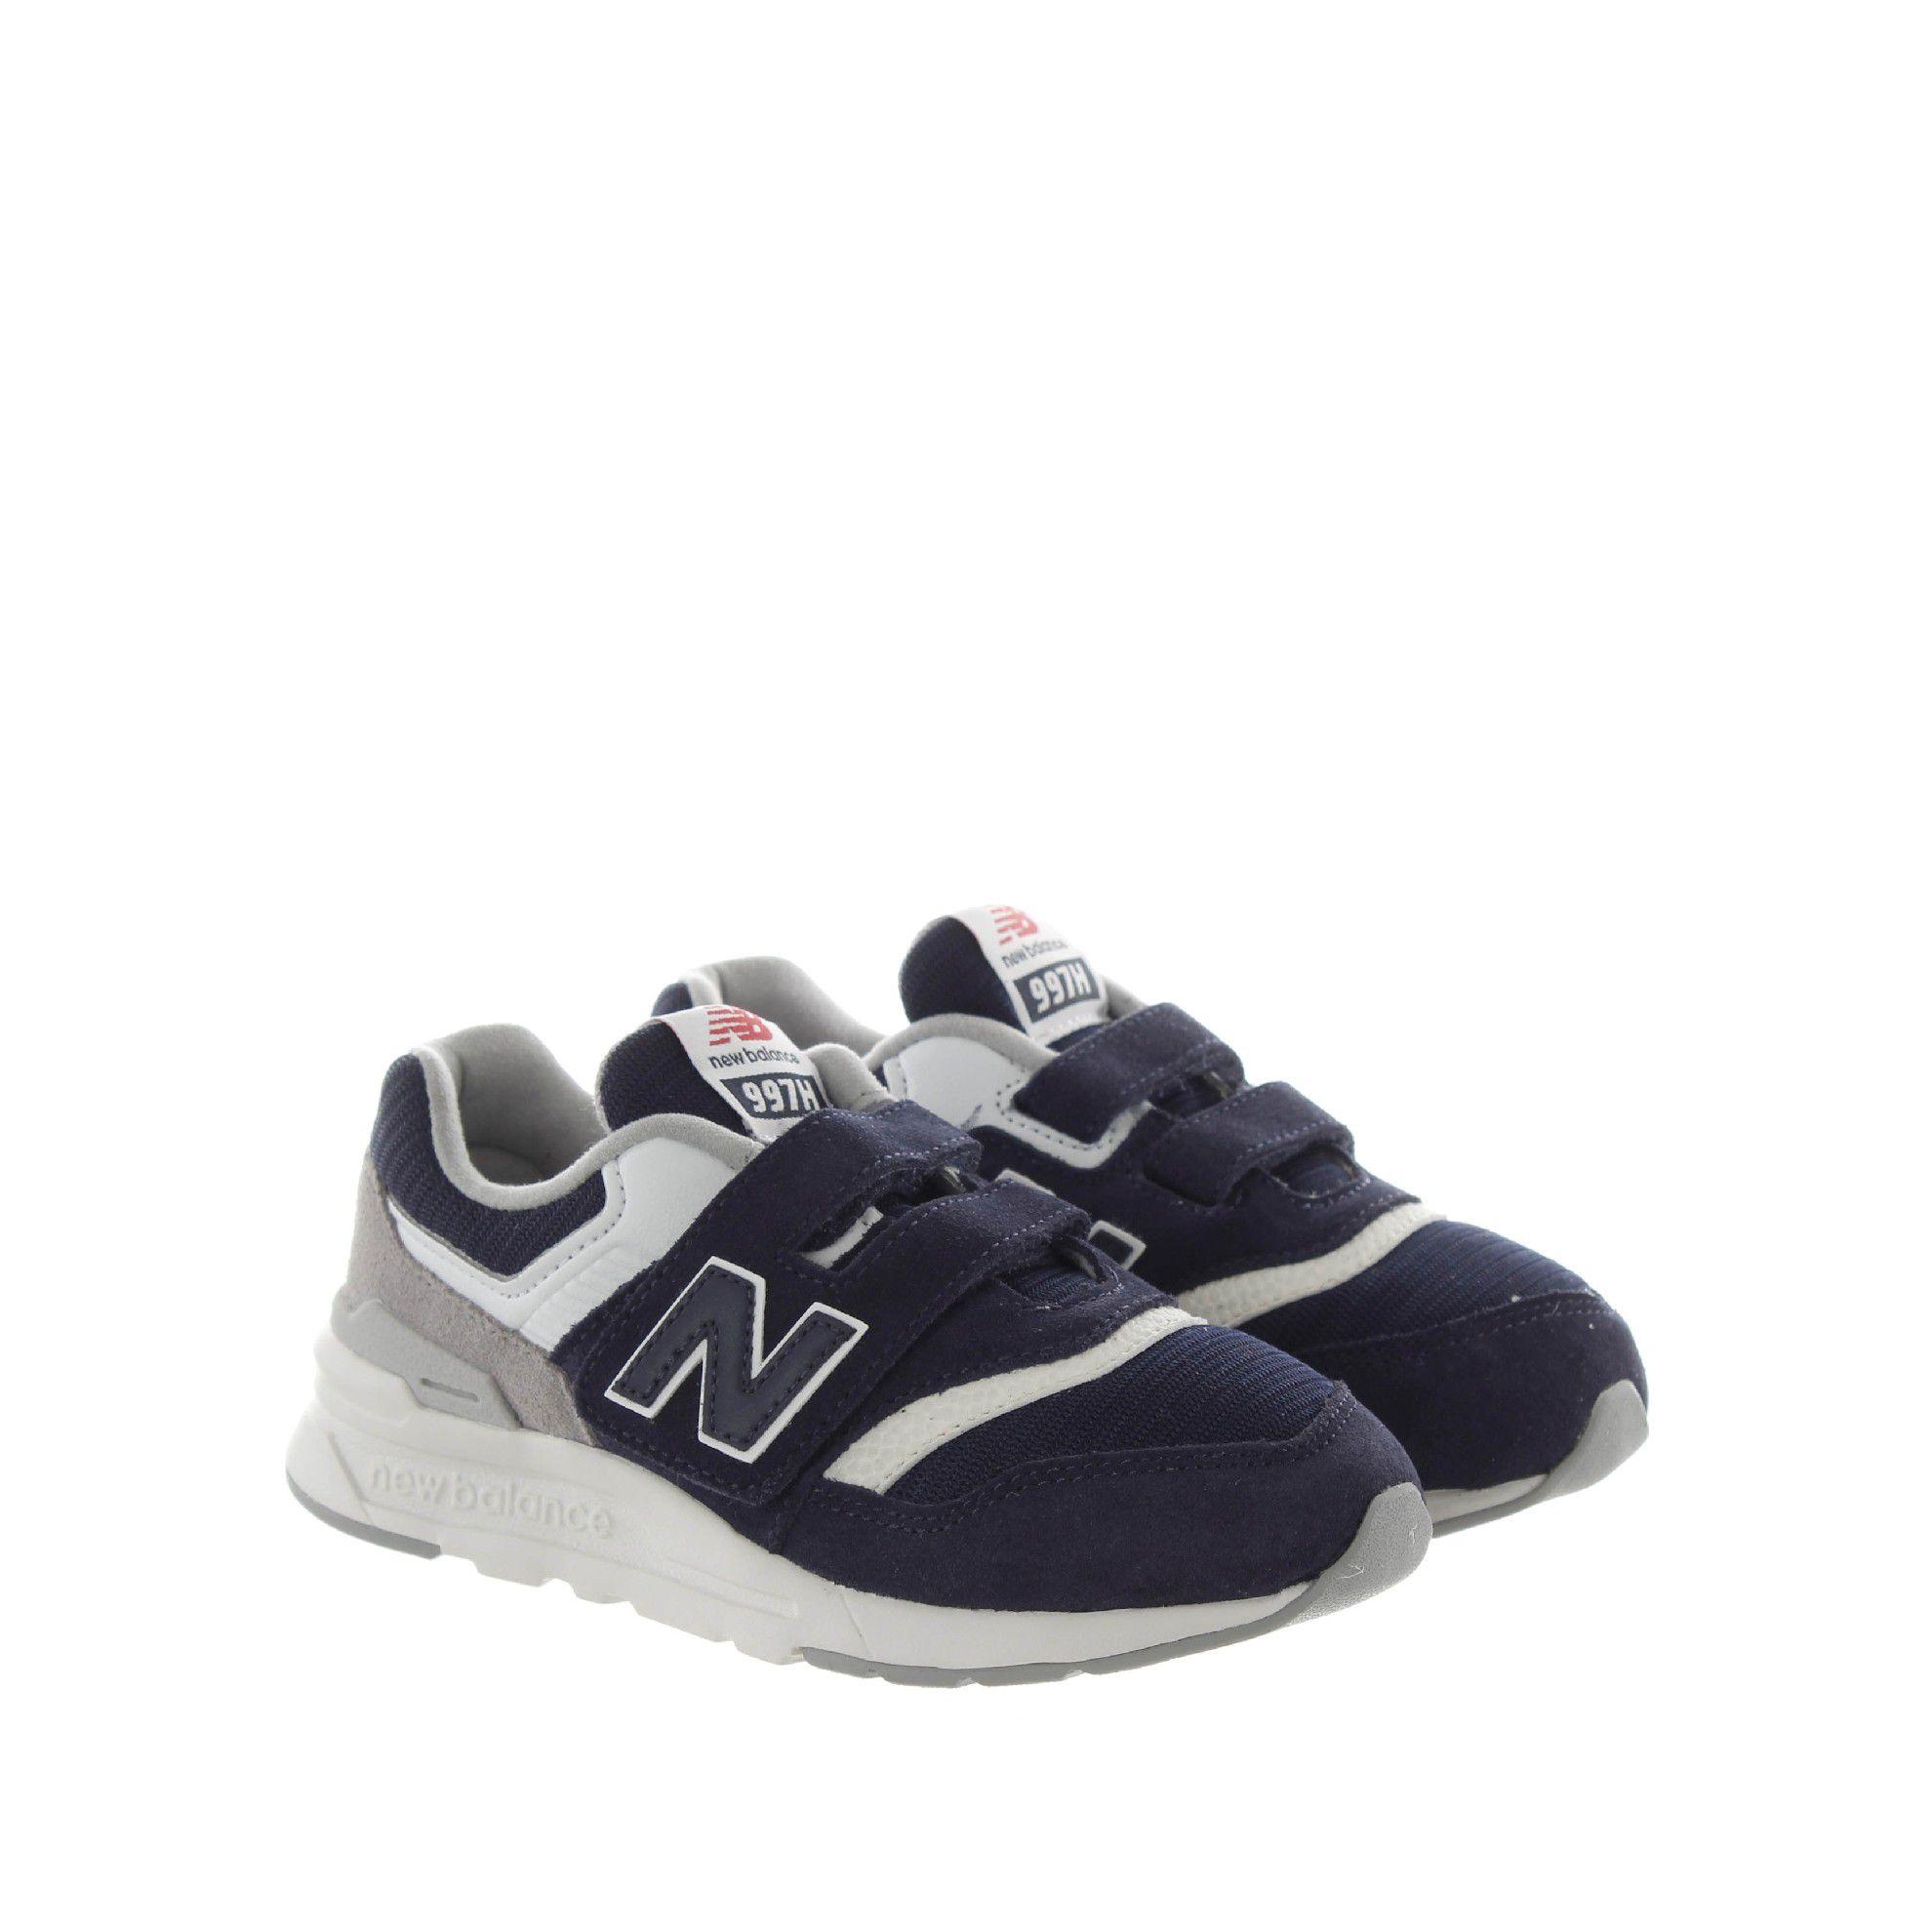 New balance sneaker 997 in suede e tessuto tecnico da bambino